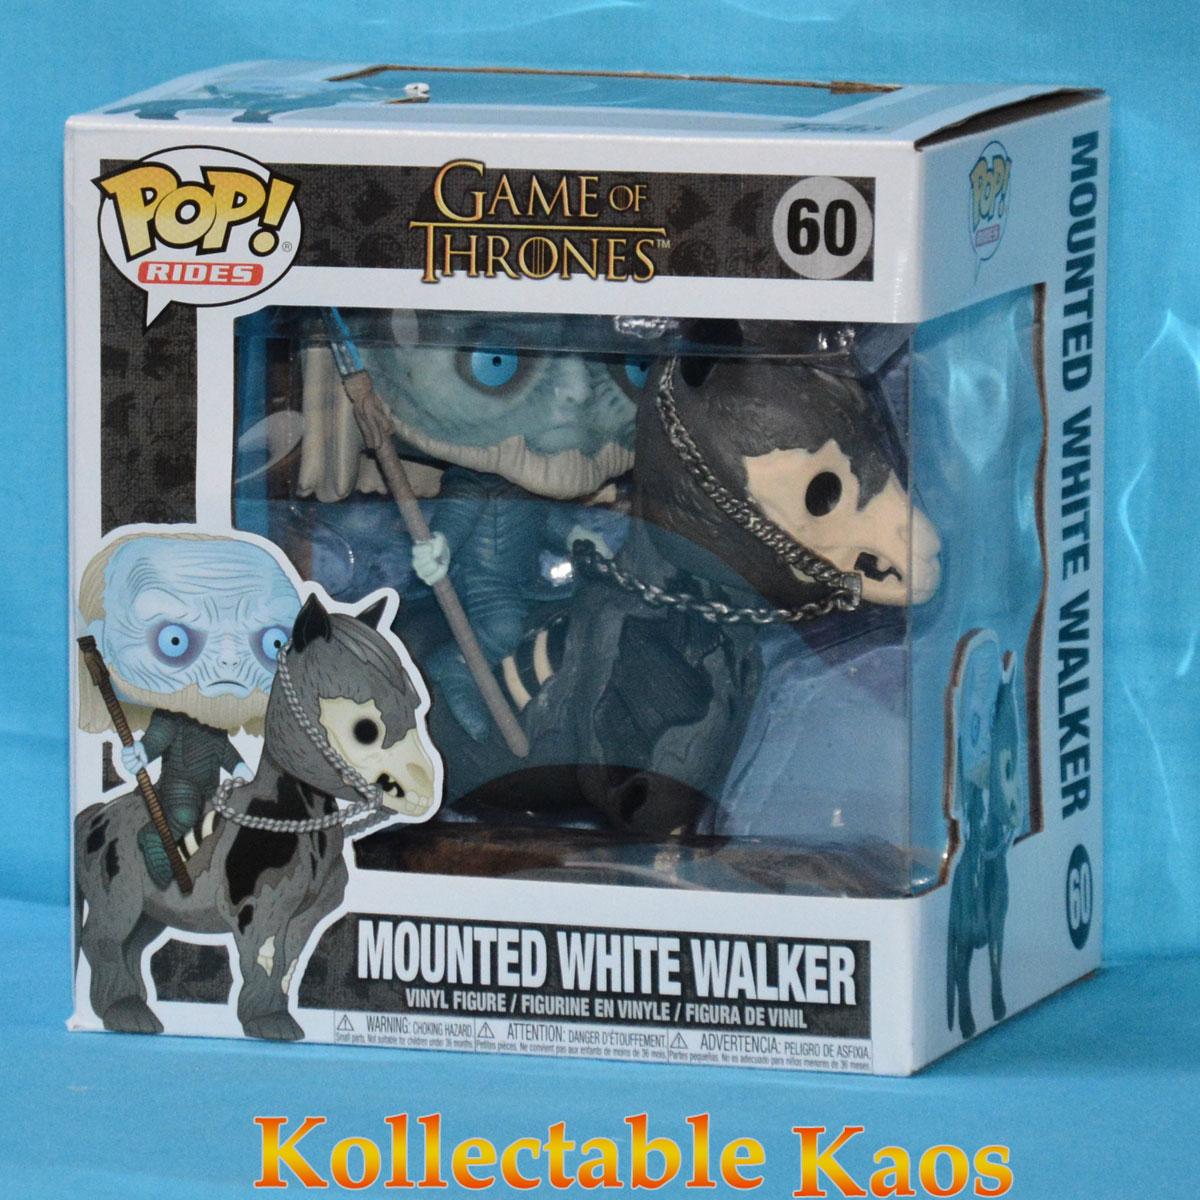 Rides Vinyl Figure White Walker on Horse Pop Game of Thrones